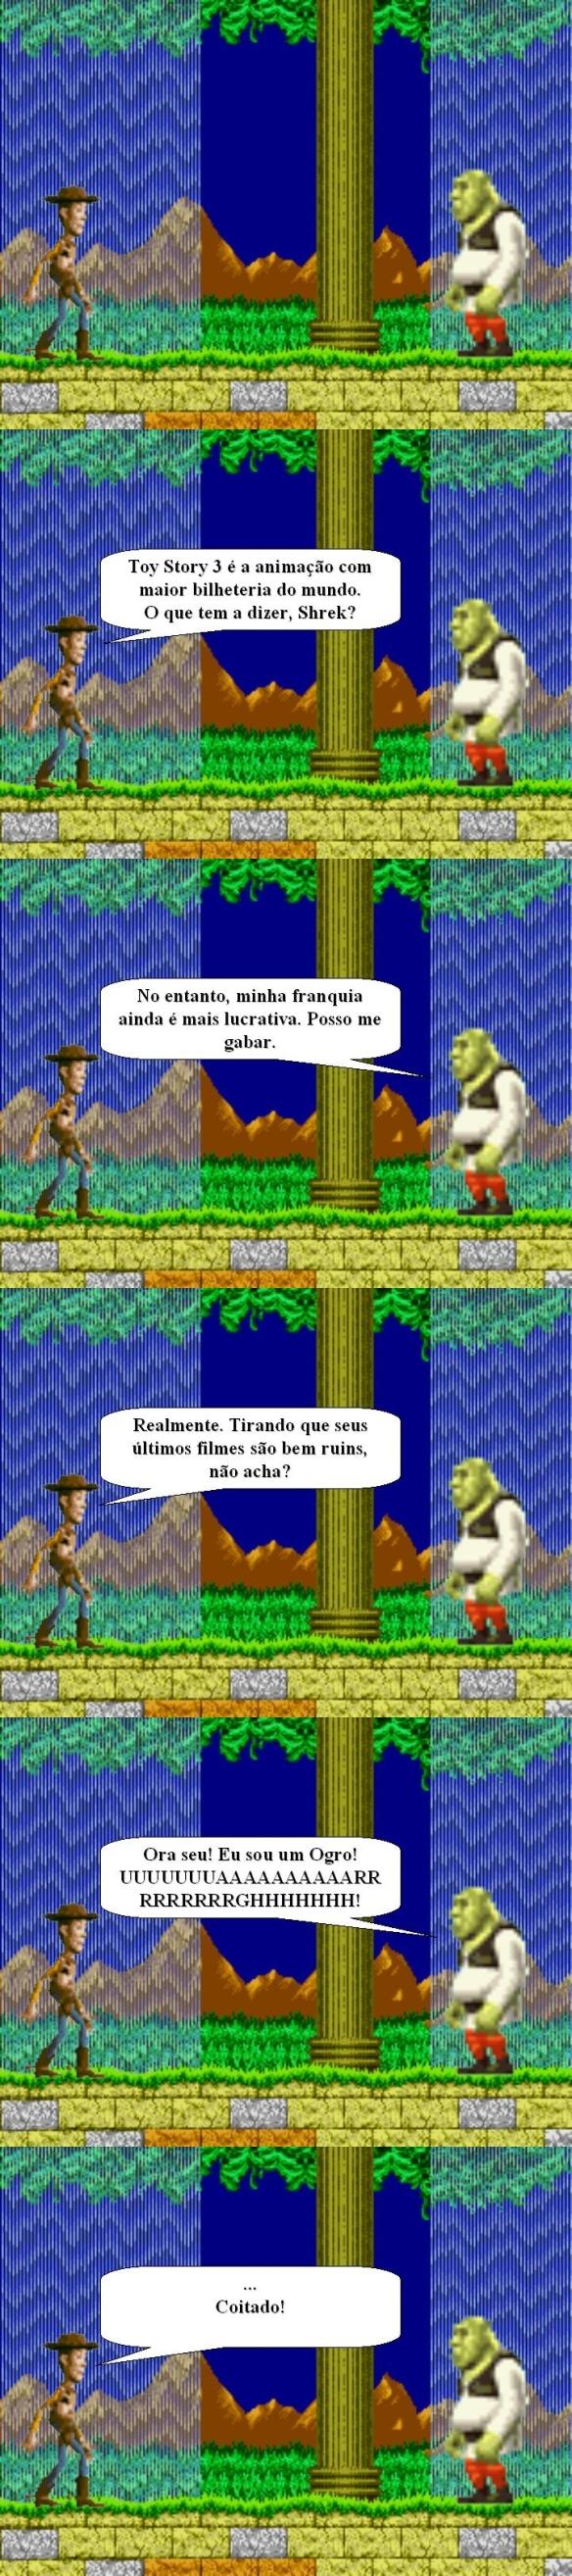 Woody Vs. Shrek